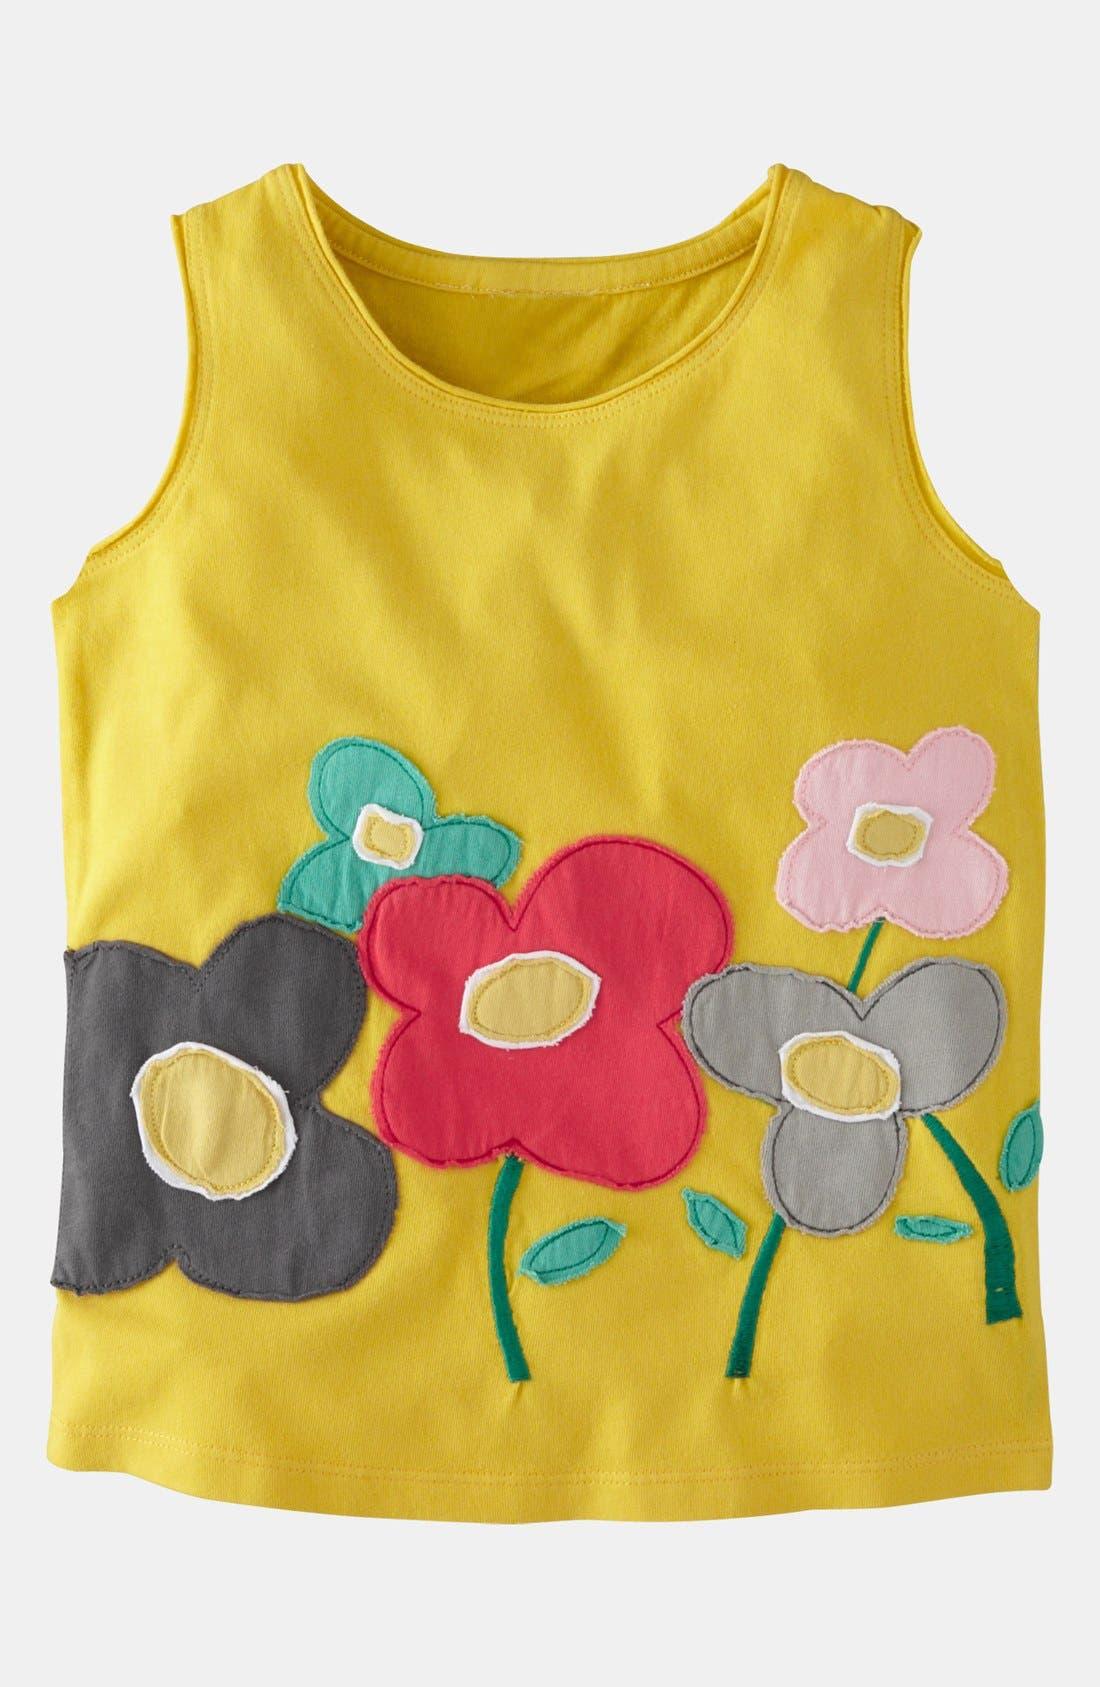 Alternate Image 1 Selected - Mini Boden 'Fab Flower' Tank Top (Toddler)